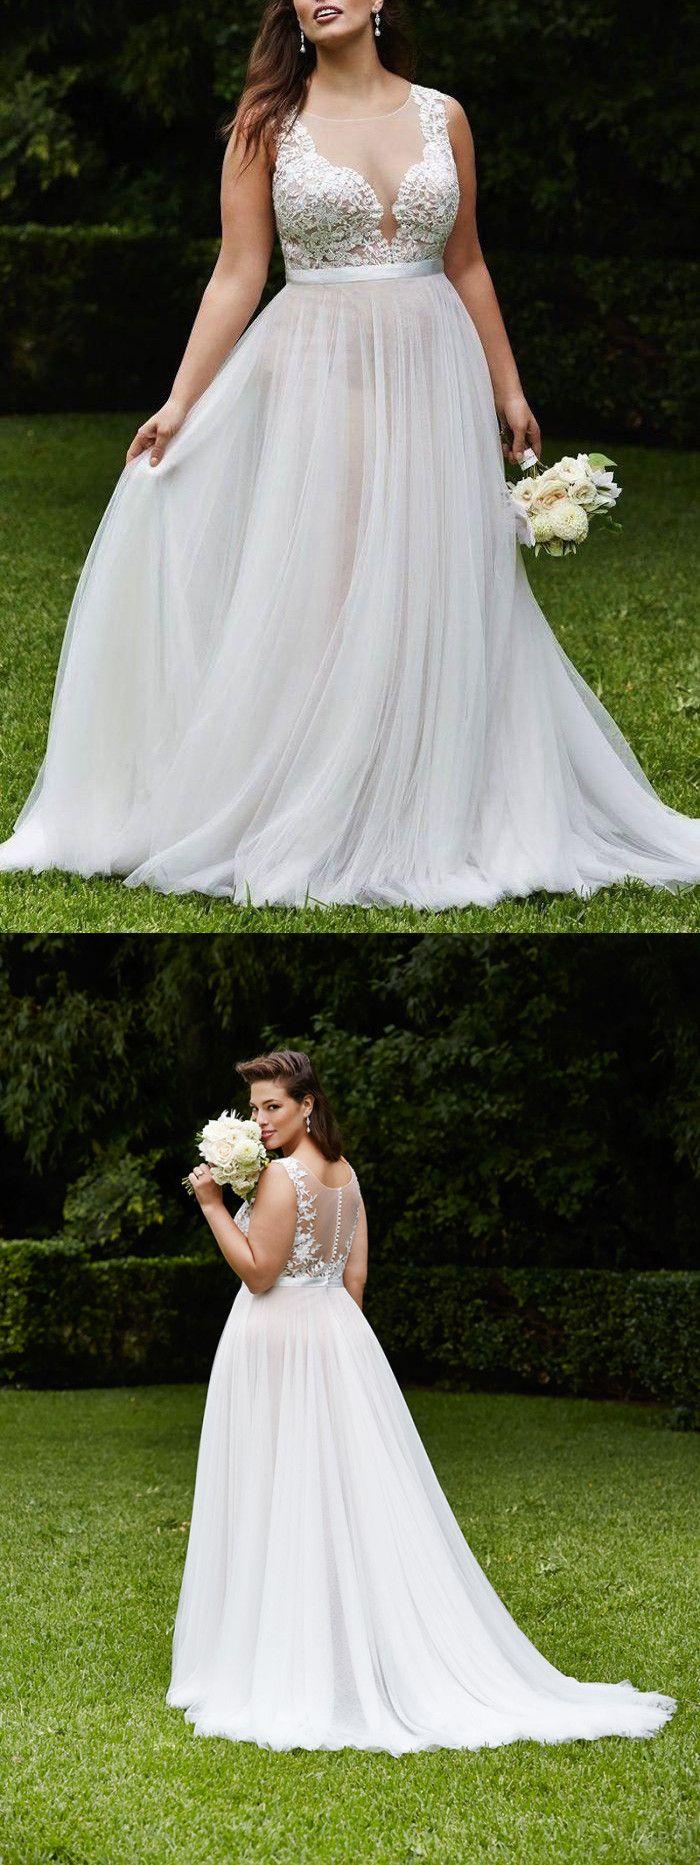 Plus Size Wedding Dresses Washington Dc : Best ideas about plus size wedding on